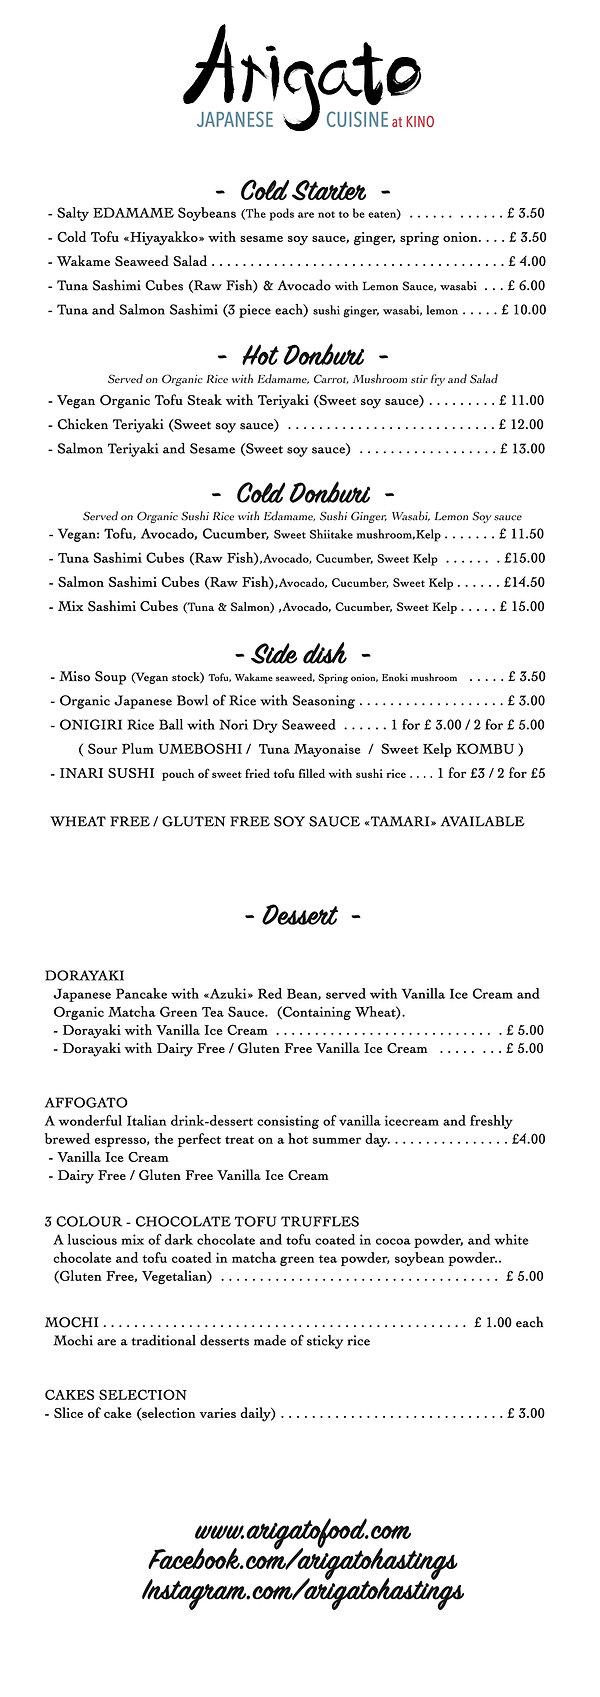 arigato-menu5-donburi-21oct.jpg